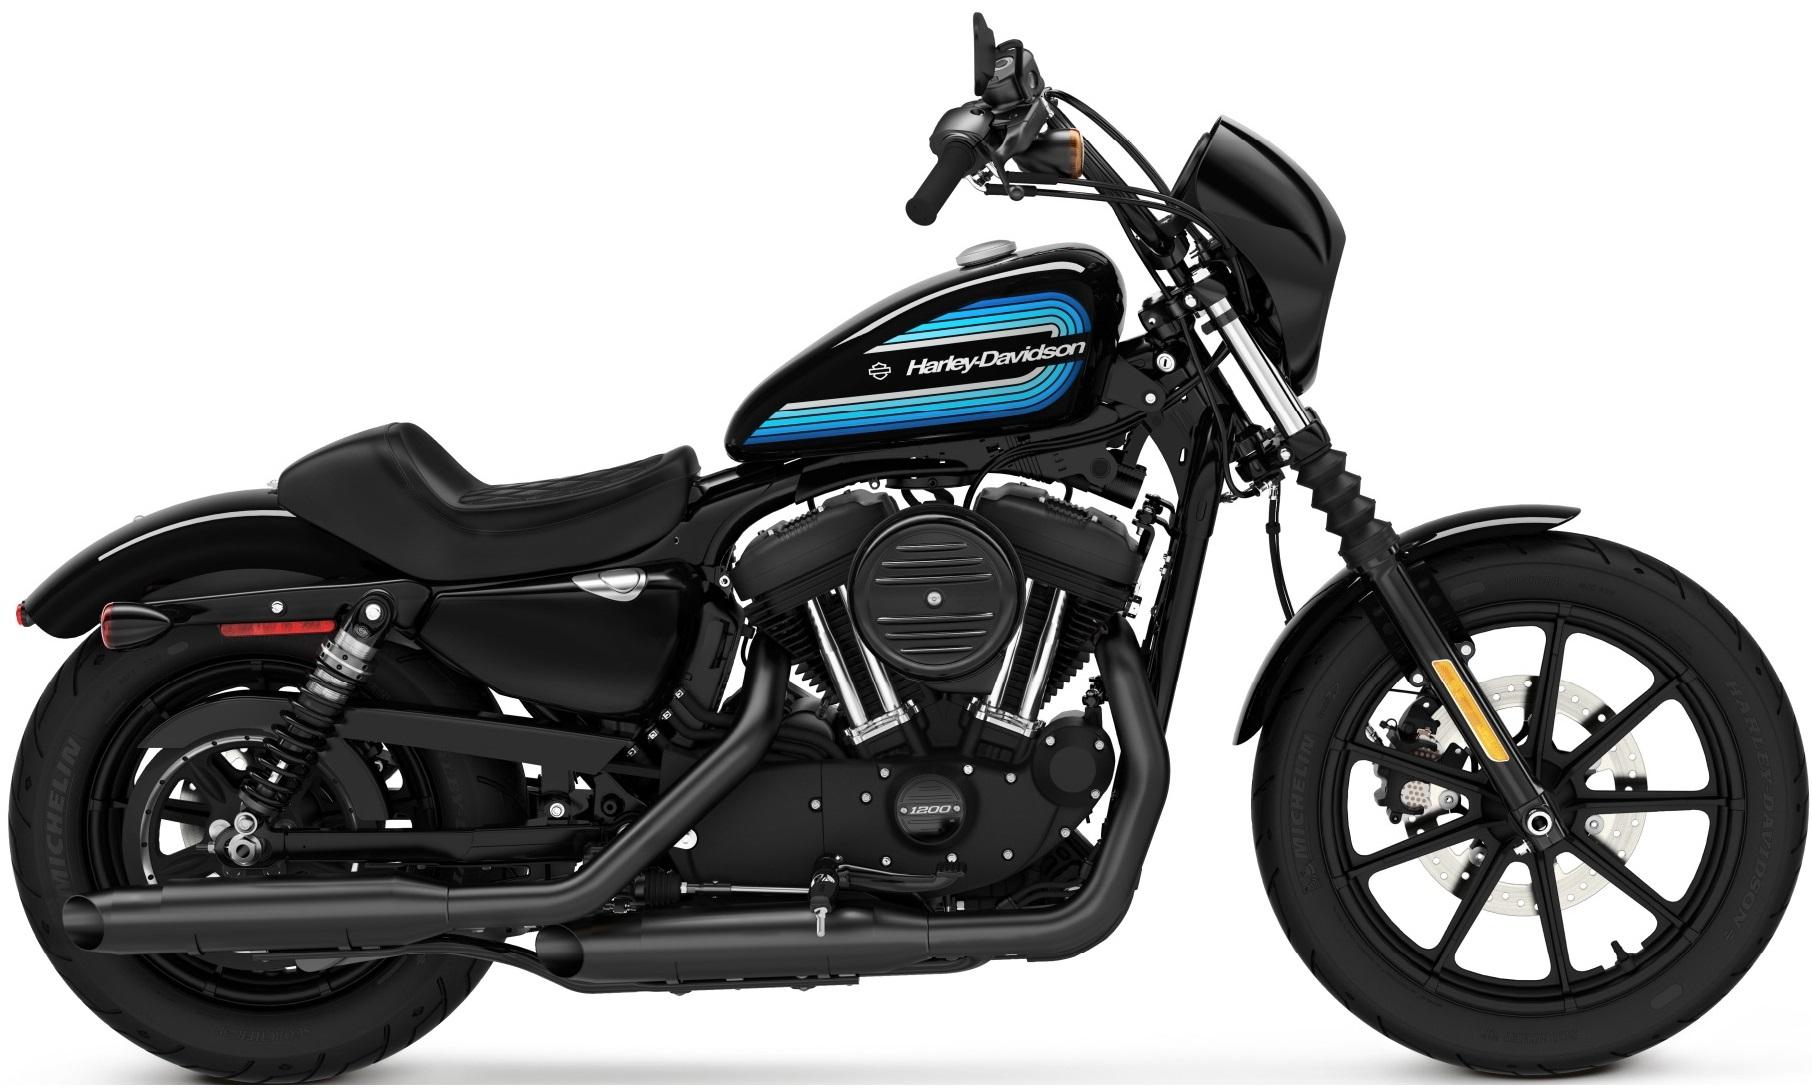 1812x1088 2018 Harley Davidson Iron 1200 Top Speed